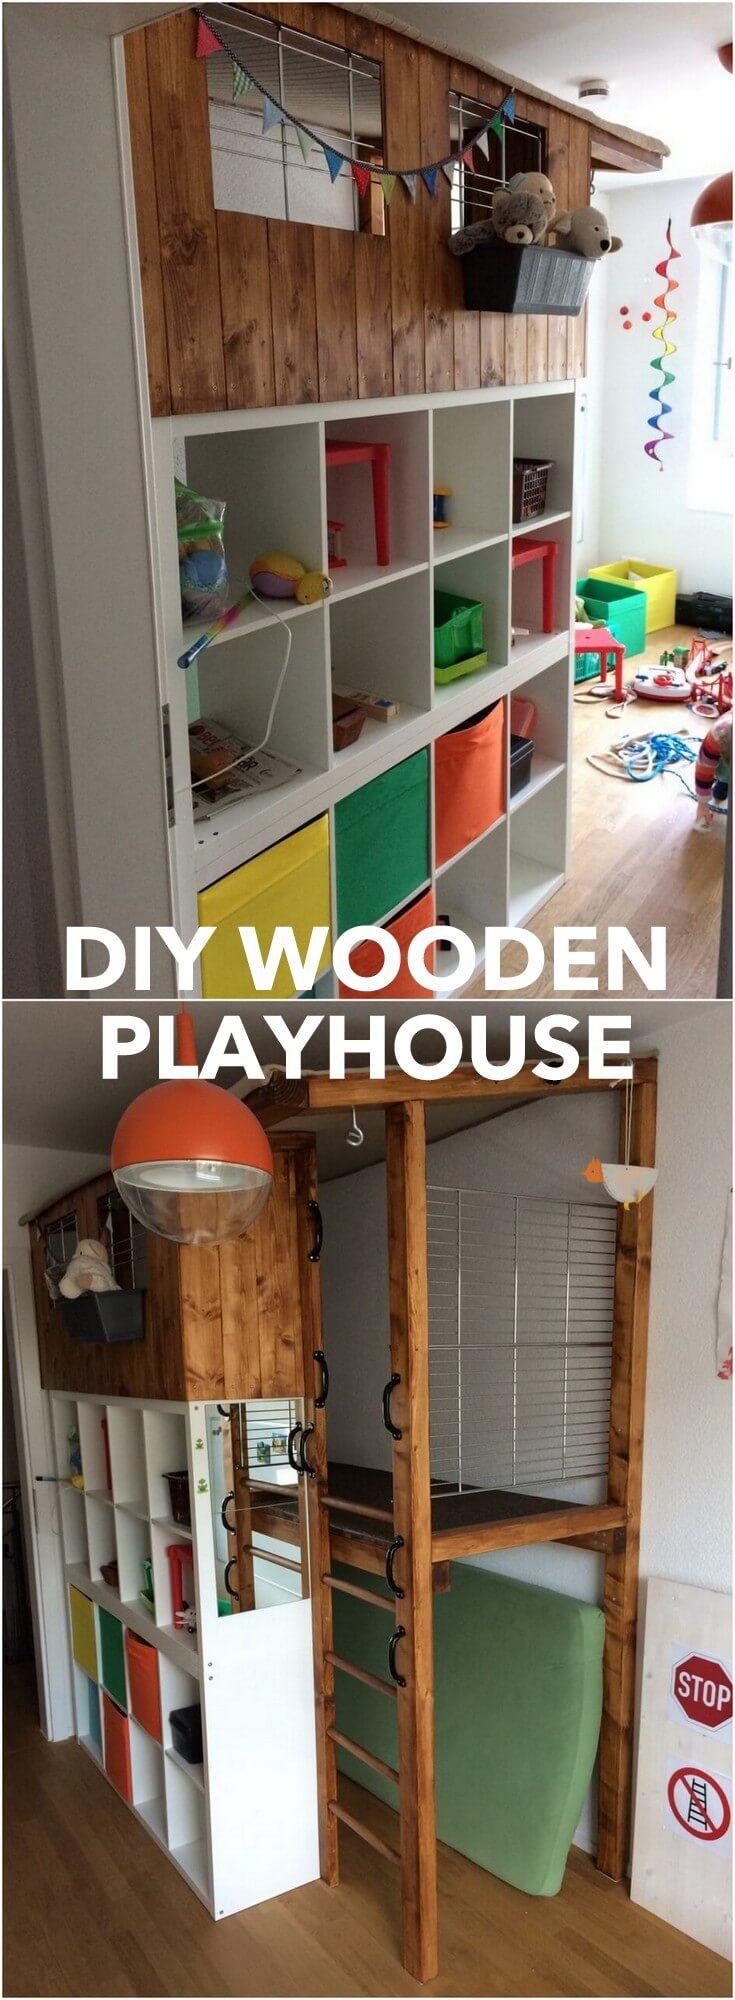 Playhouse Designs Castle Html on cardboard castle designs, castle playhouse plans, castle patio designs, castle playhouse with slide, castle bedroom designs, castle playhouse ideas, lego castle designs,